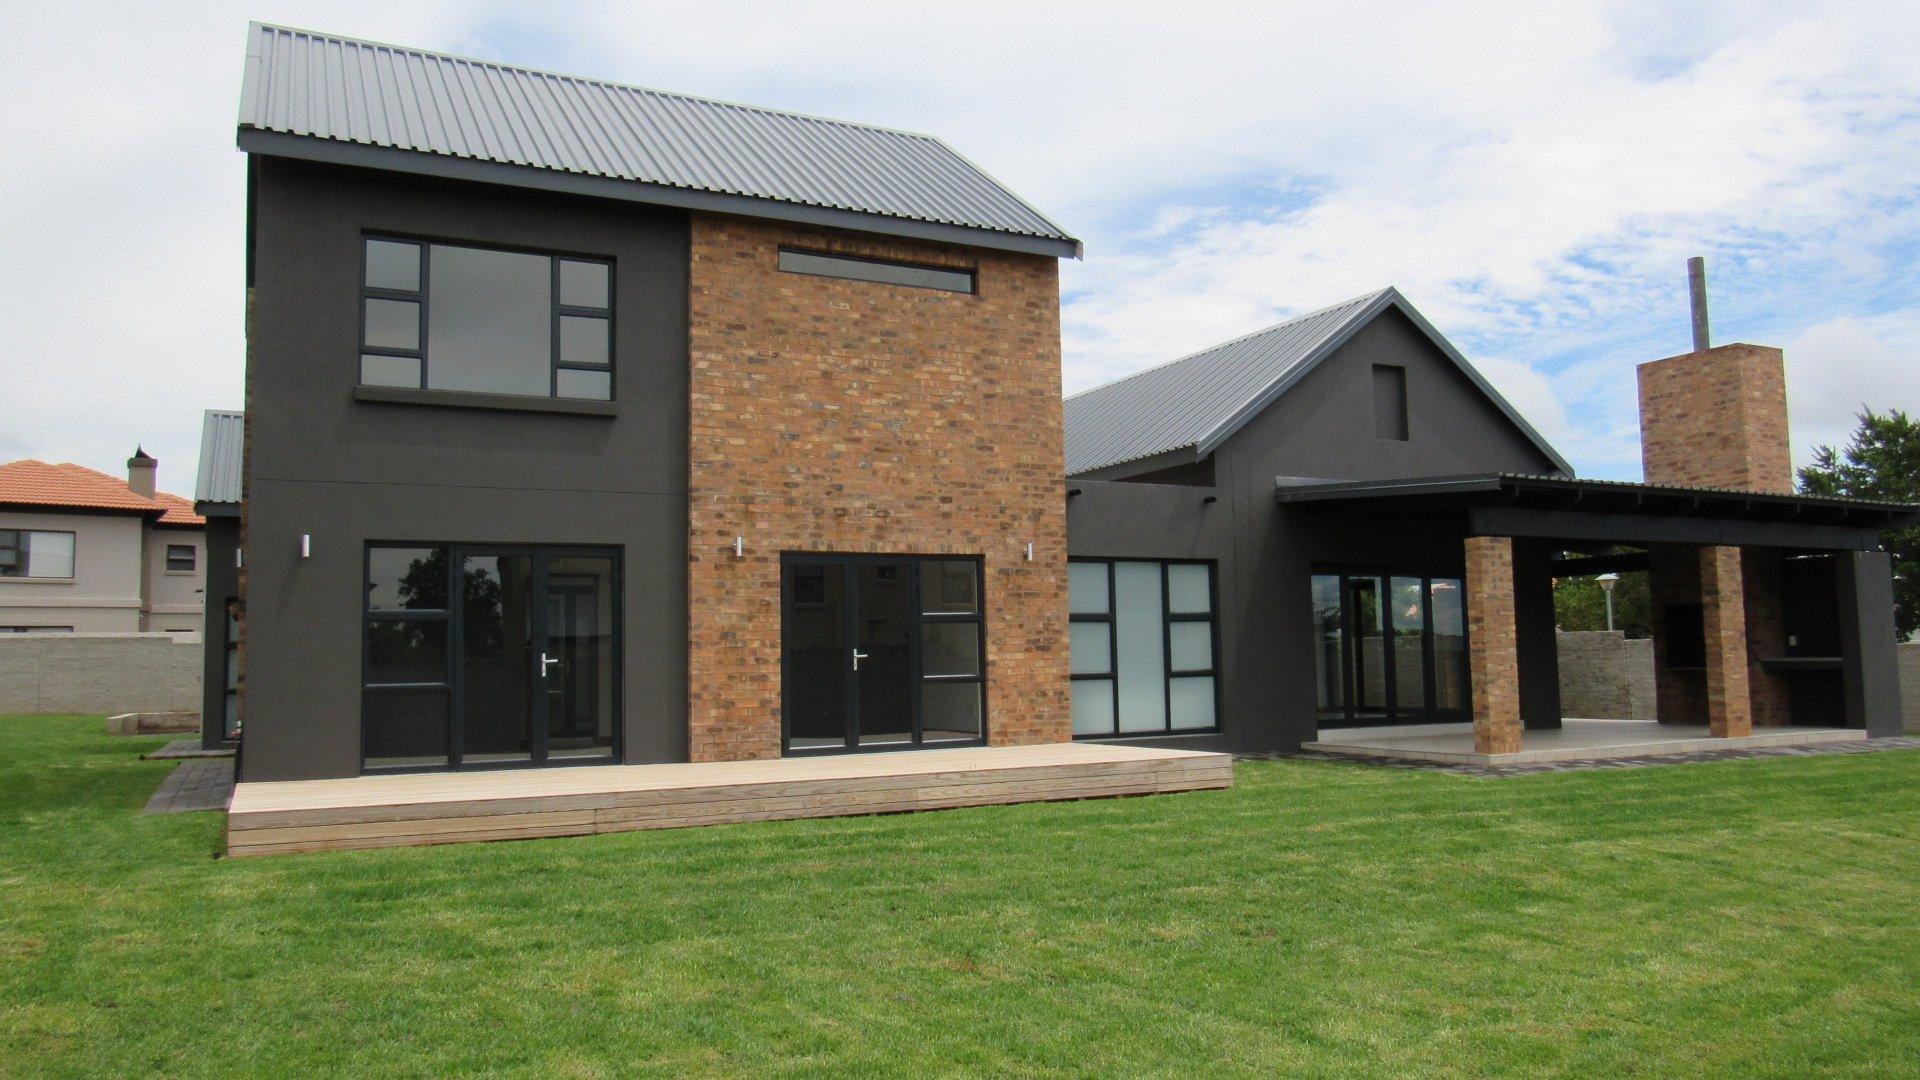 Pretoria, Hazeldean Property  | Houses For Sale Hazeldean, Hazeldean, House 4 bedrooms property for sale Price:4,500,000